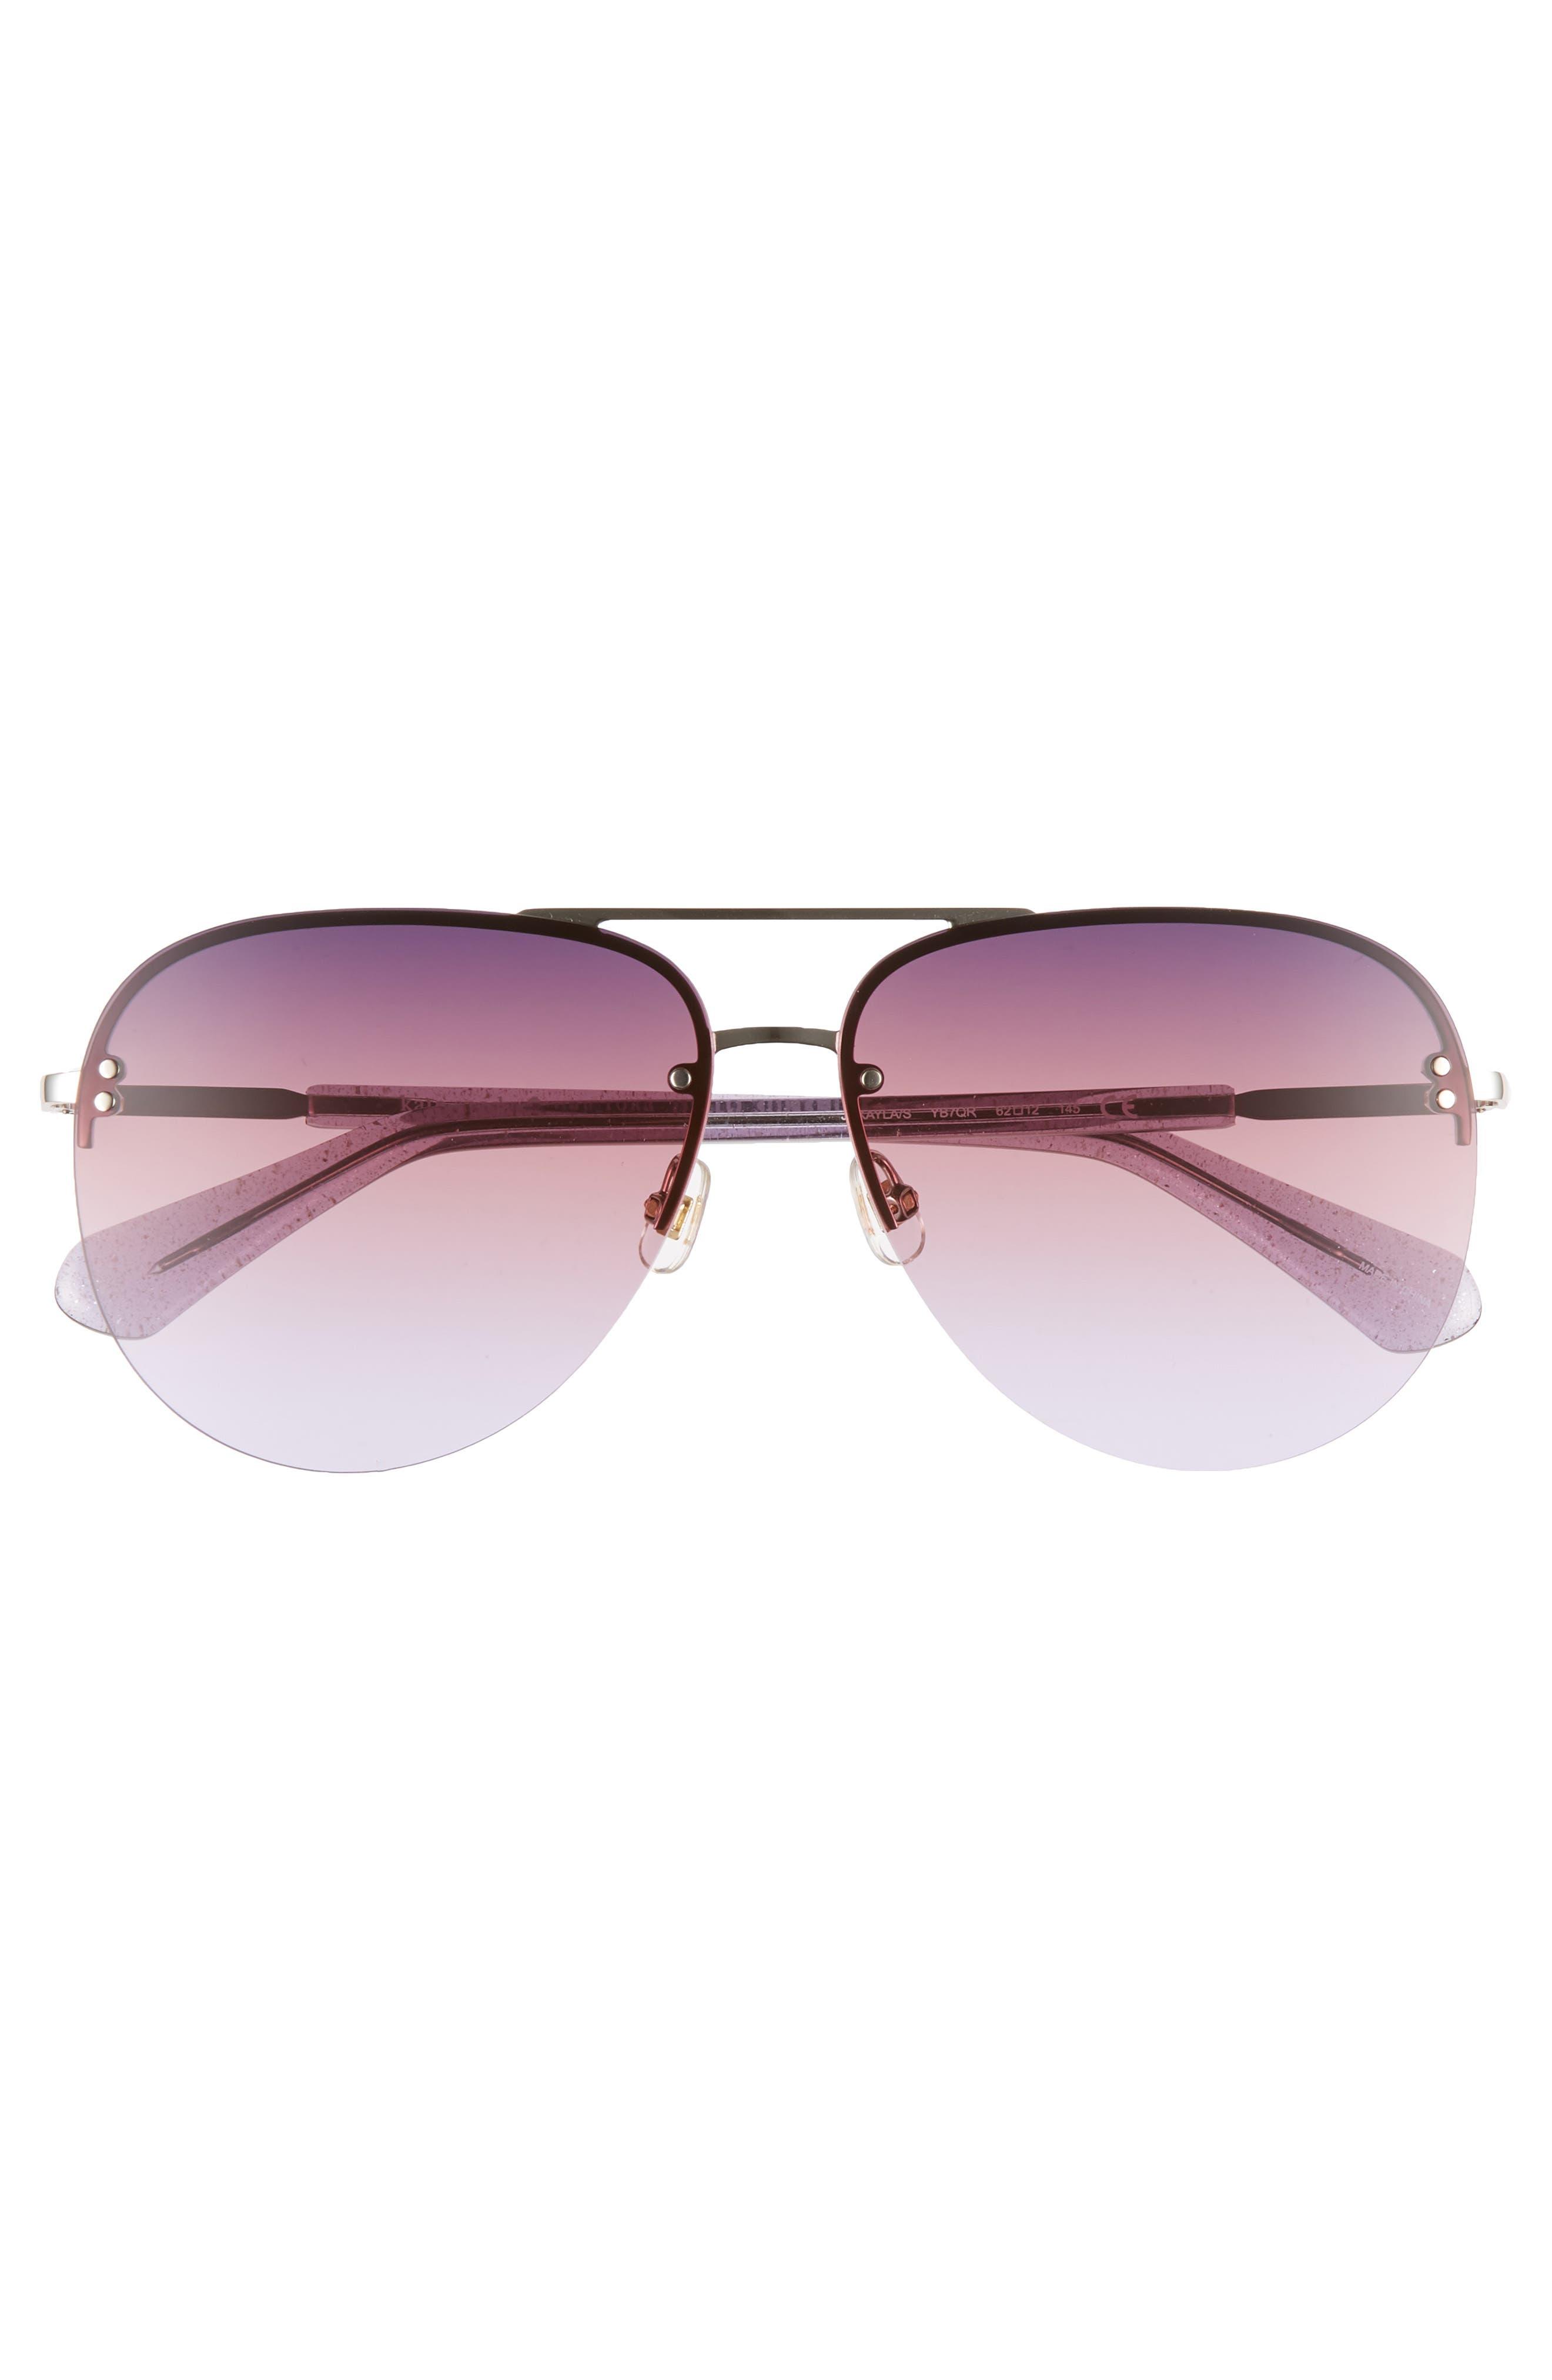 jakaylas 62mm aviator sunglasses,                             Alternate thumbnail 3, color,                             SILVER